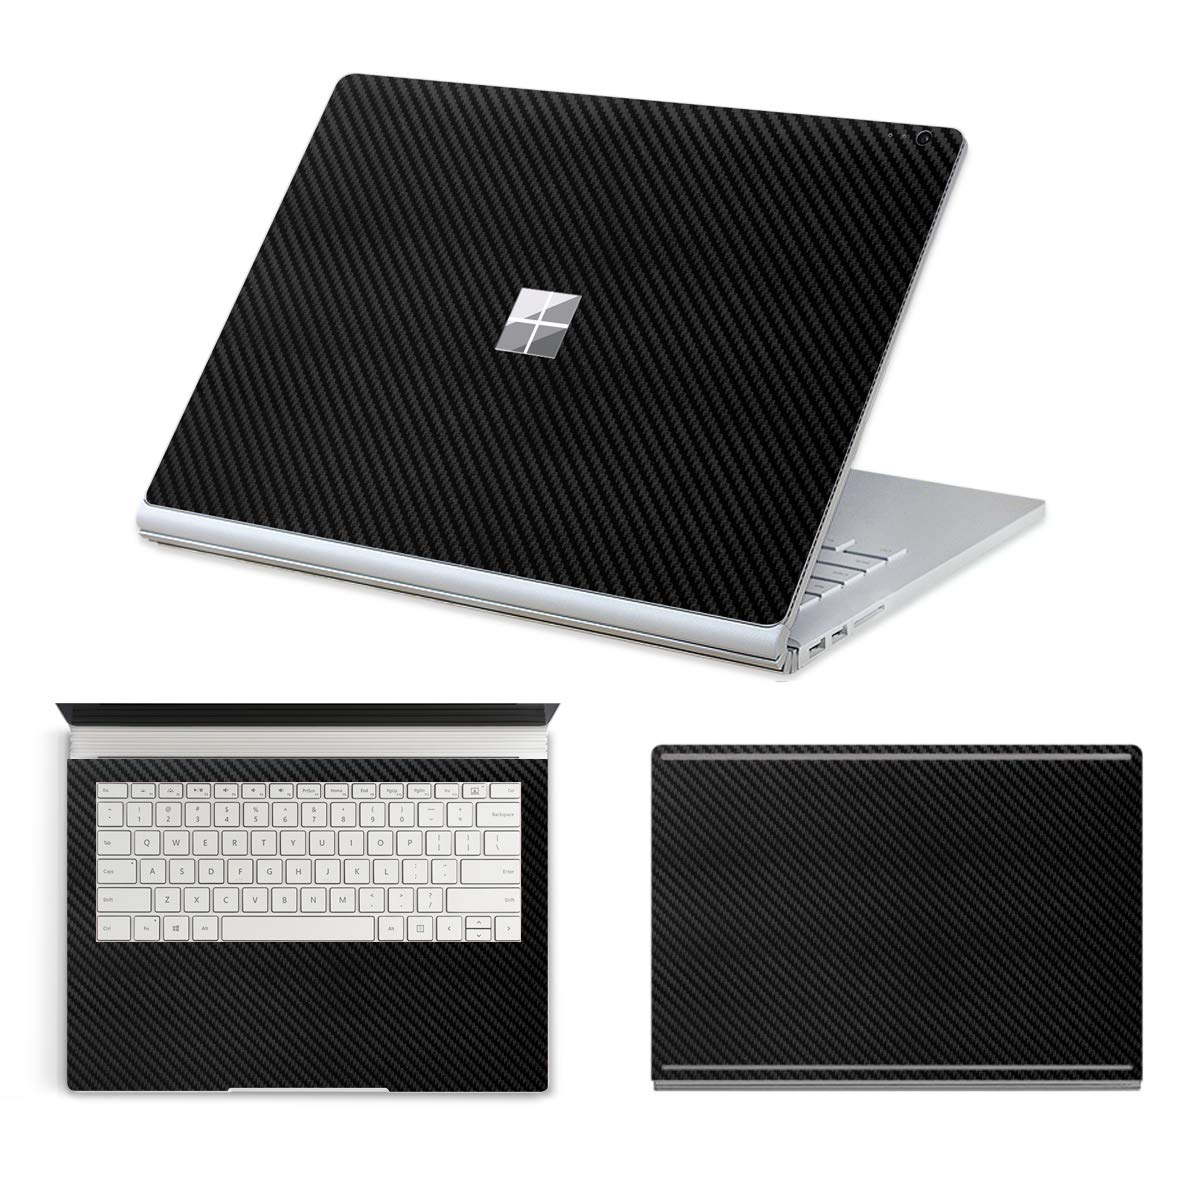 Masino Premium TPU Keyboard Cover Ultra Thin Keyboard Protector Skin for 13.5' 13.5 inch Microsoft Surface Book 2 (2017 Released) (for 13.5' Surface Book 2 (Intel Core i5), TPU Keyboard Skin- Clear)